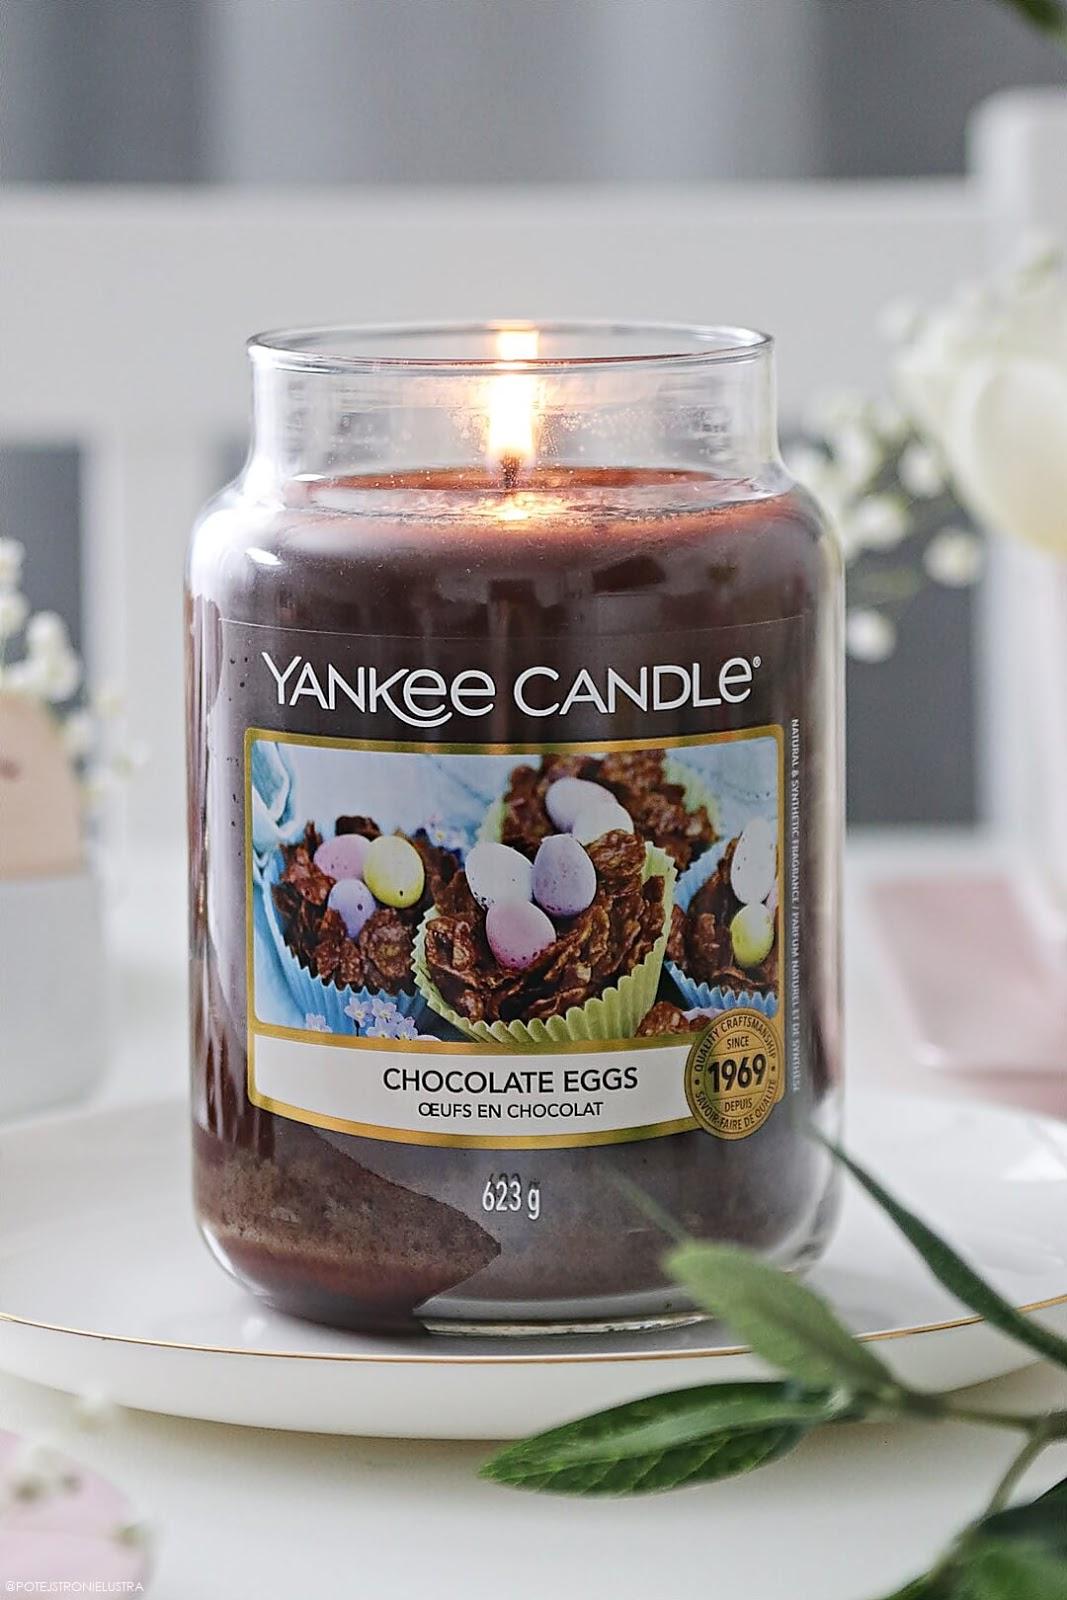 yankee candle chocolate eggs nowy zapach na wielkanoc 2020